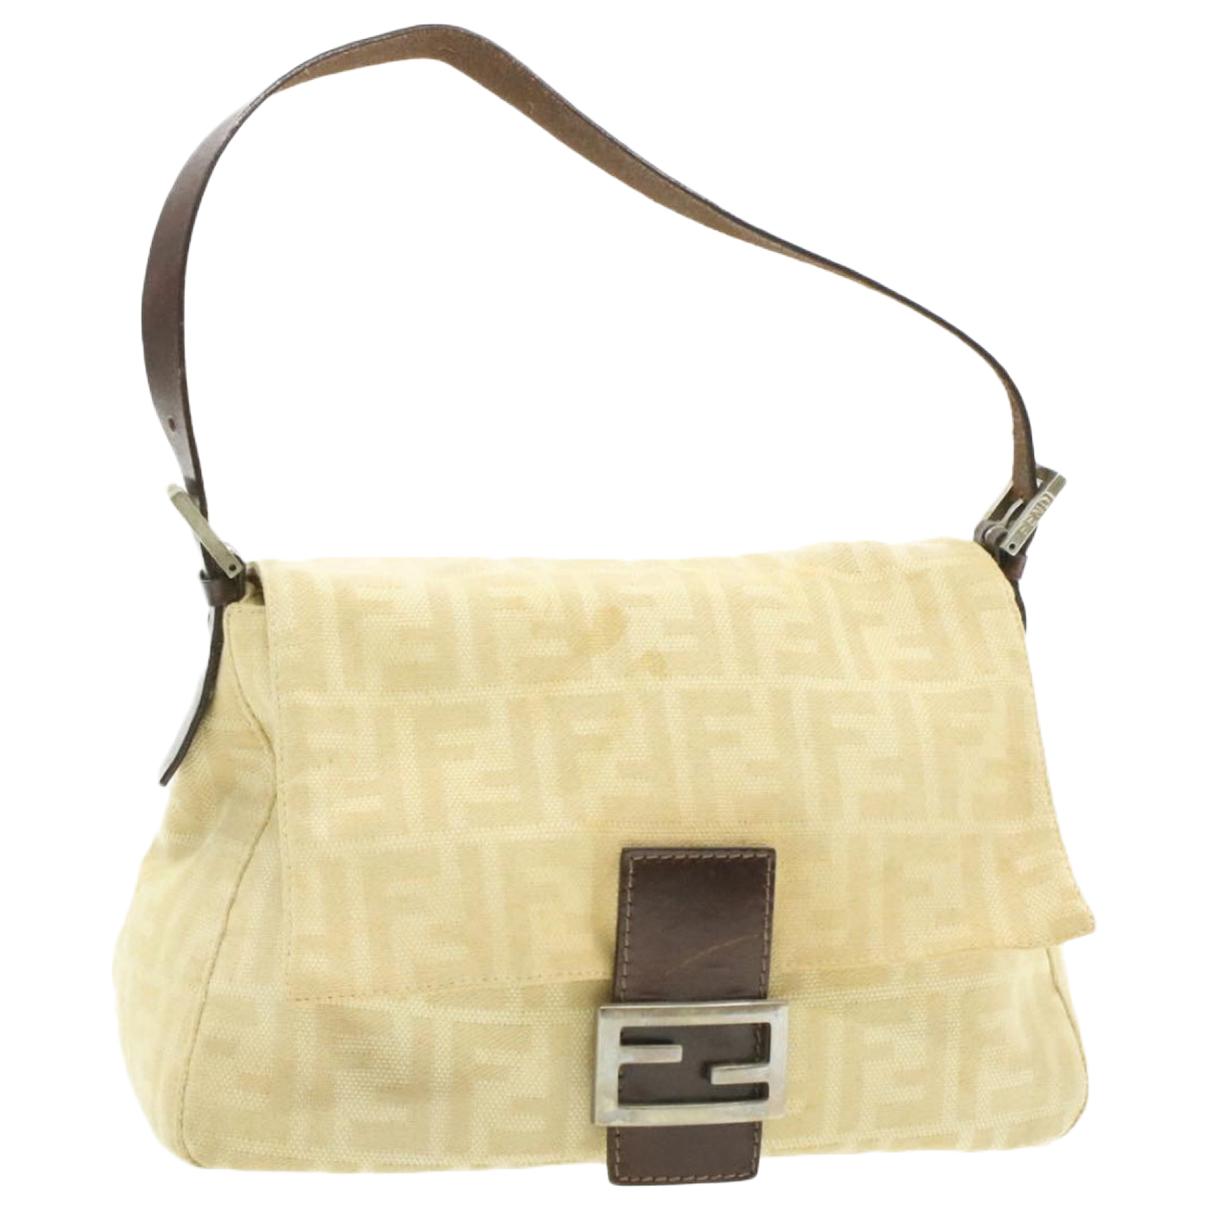 Fendi Mamma Baguette  Handtasche in  Beige Leinen